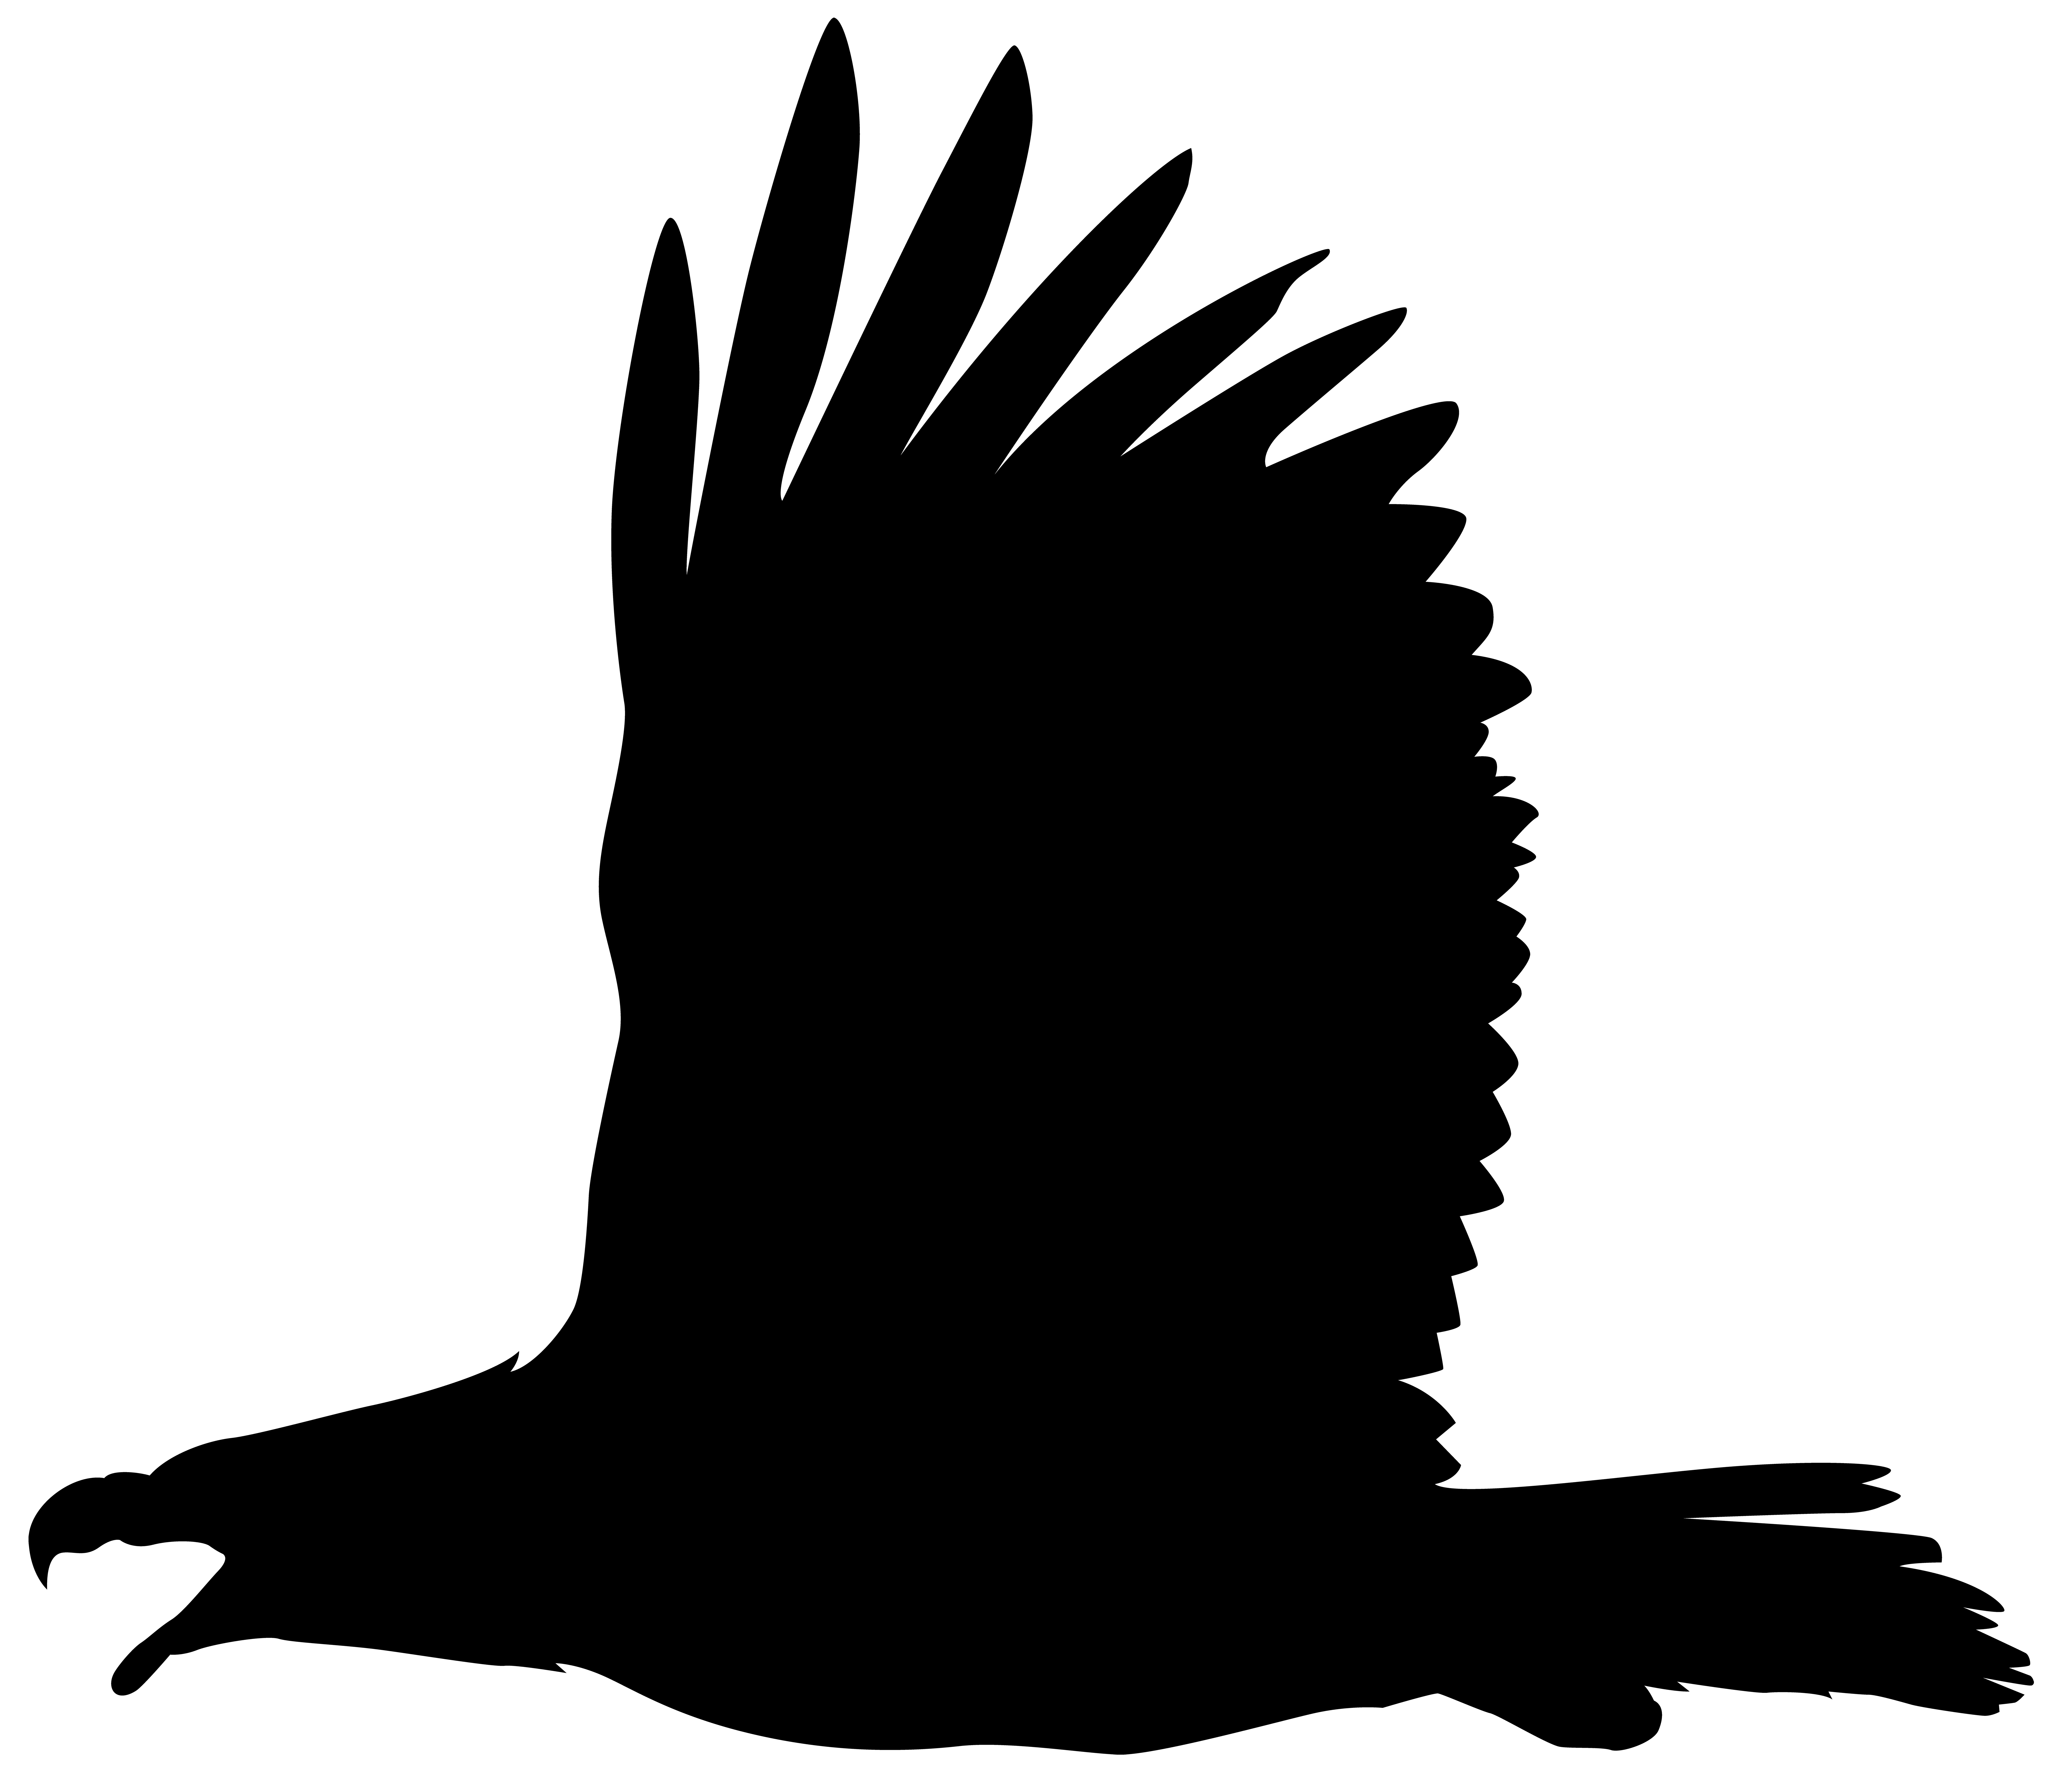 Eagle Silhouette PNG Clip Art Image.